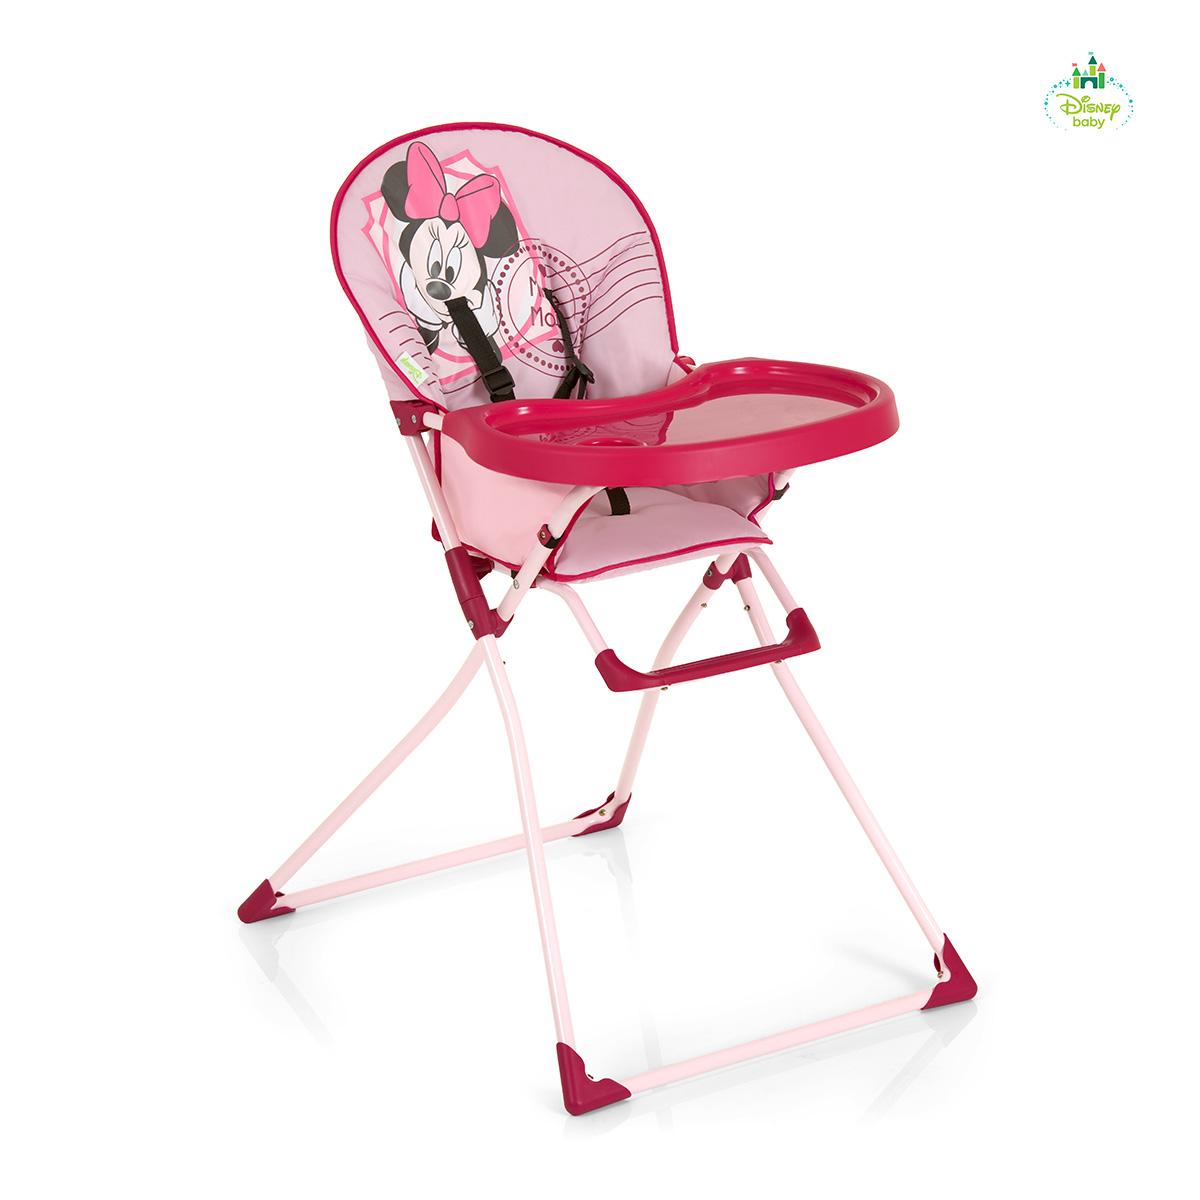 Haute Pink 2016 Disney BabyMickeyamp; Chaise Mac Minnie hQCsrdtx